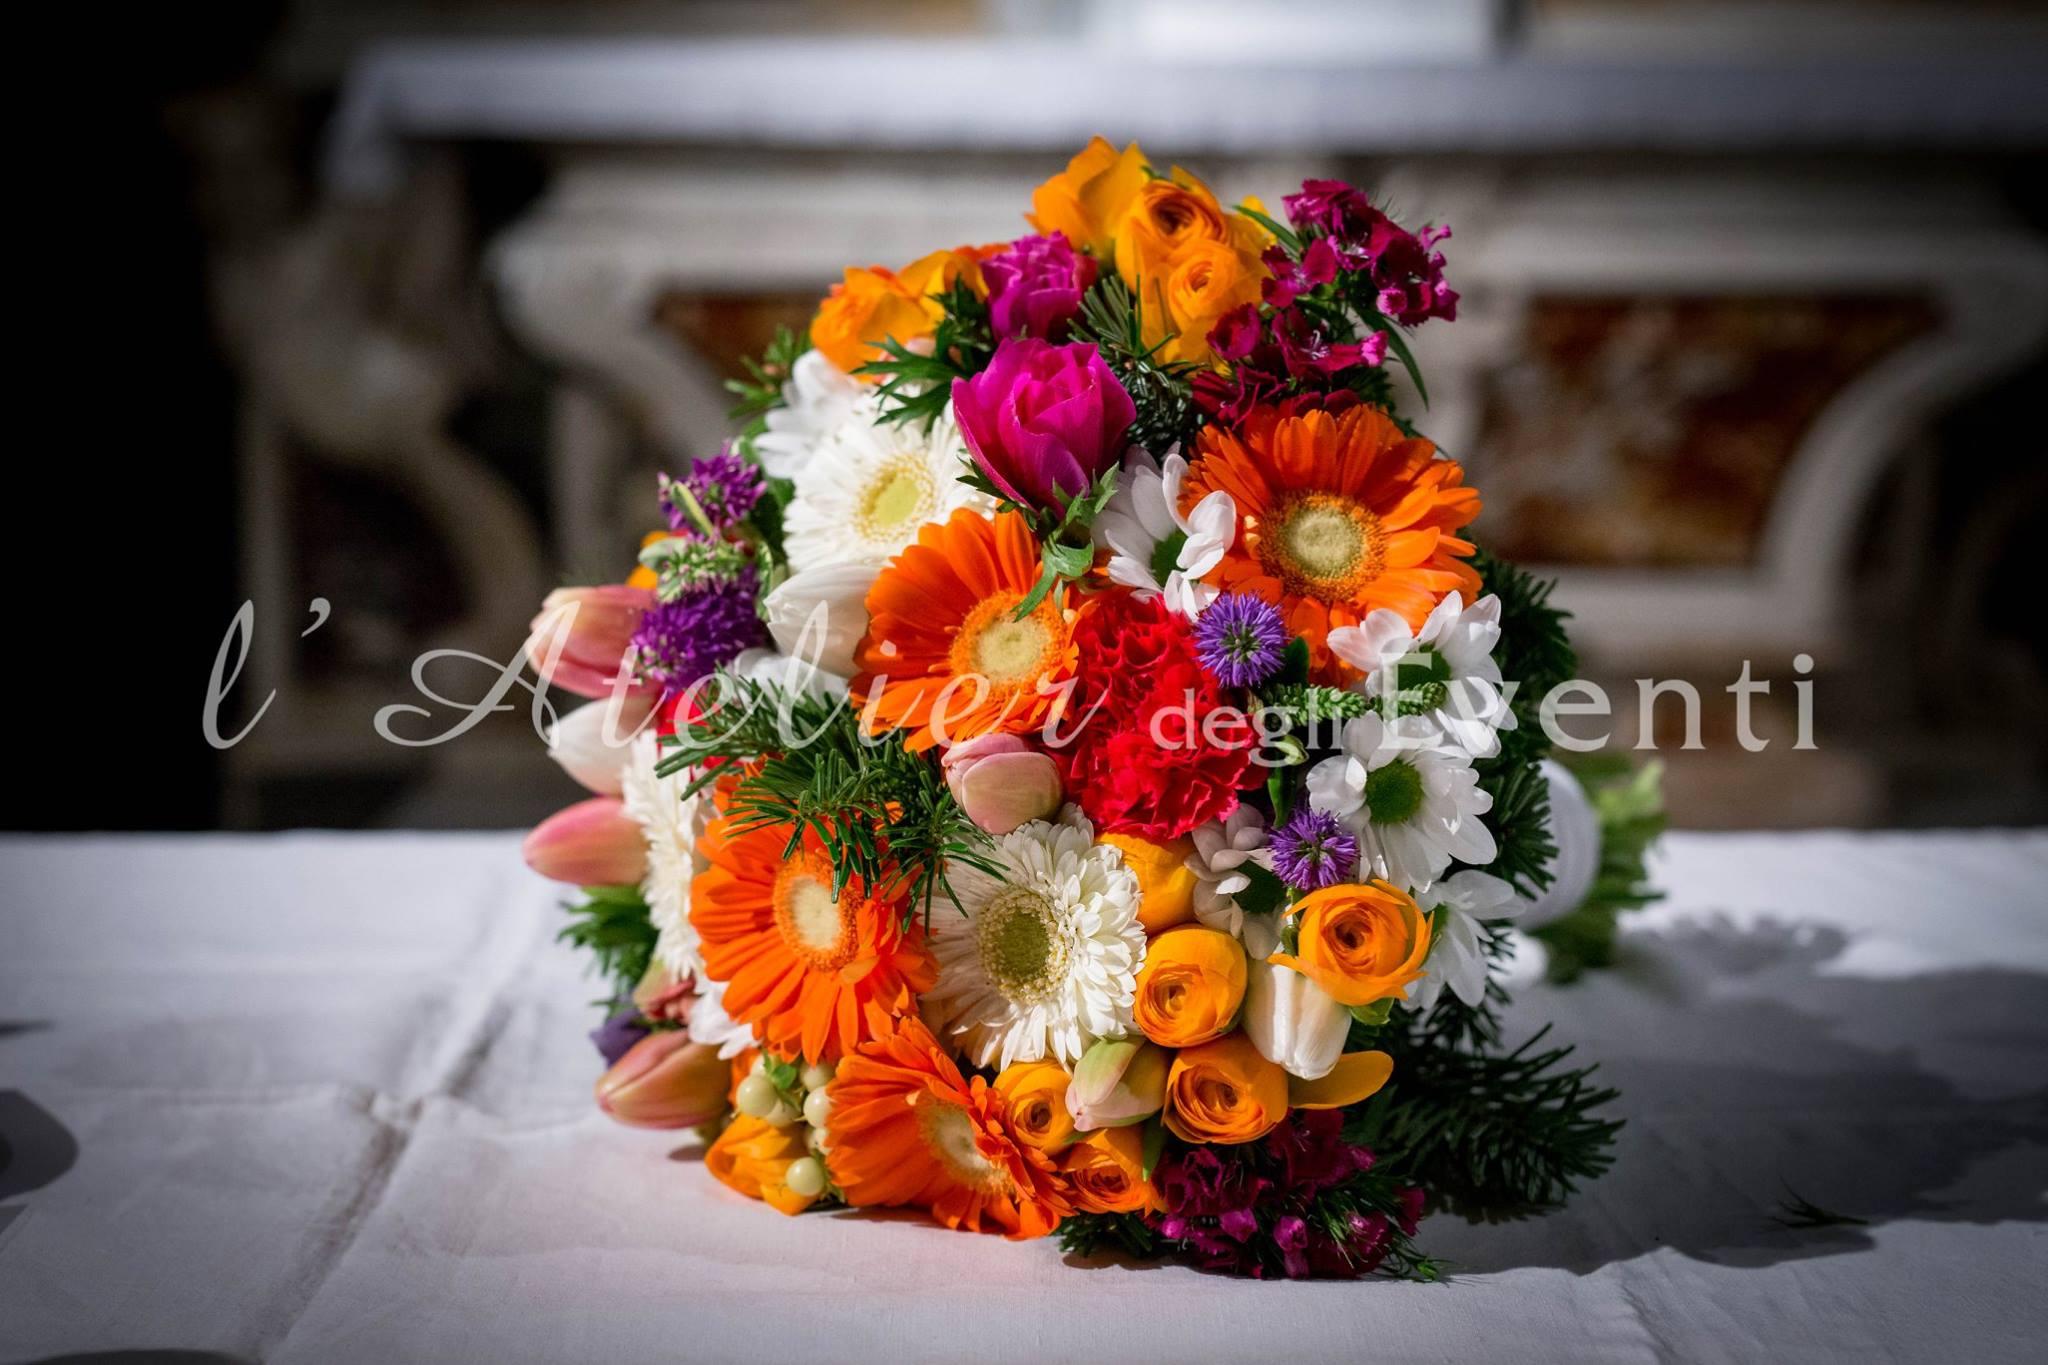 17_bouquet_sposa_colorato_matrimonio_elisabetta_massimo_floreale